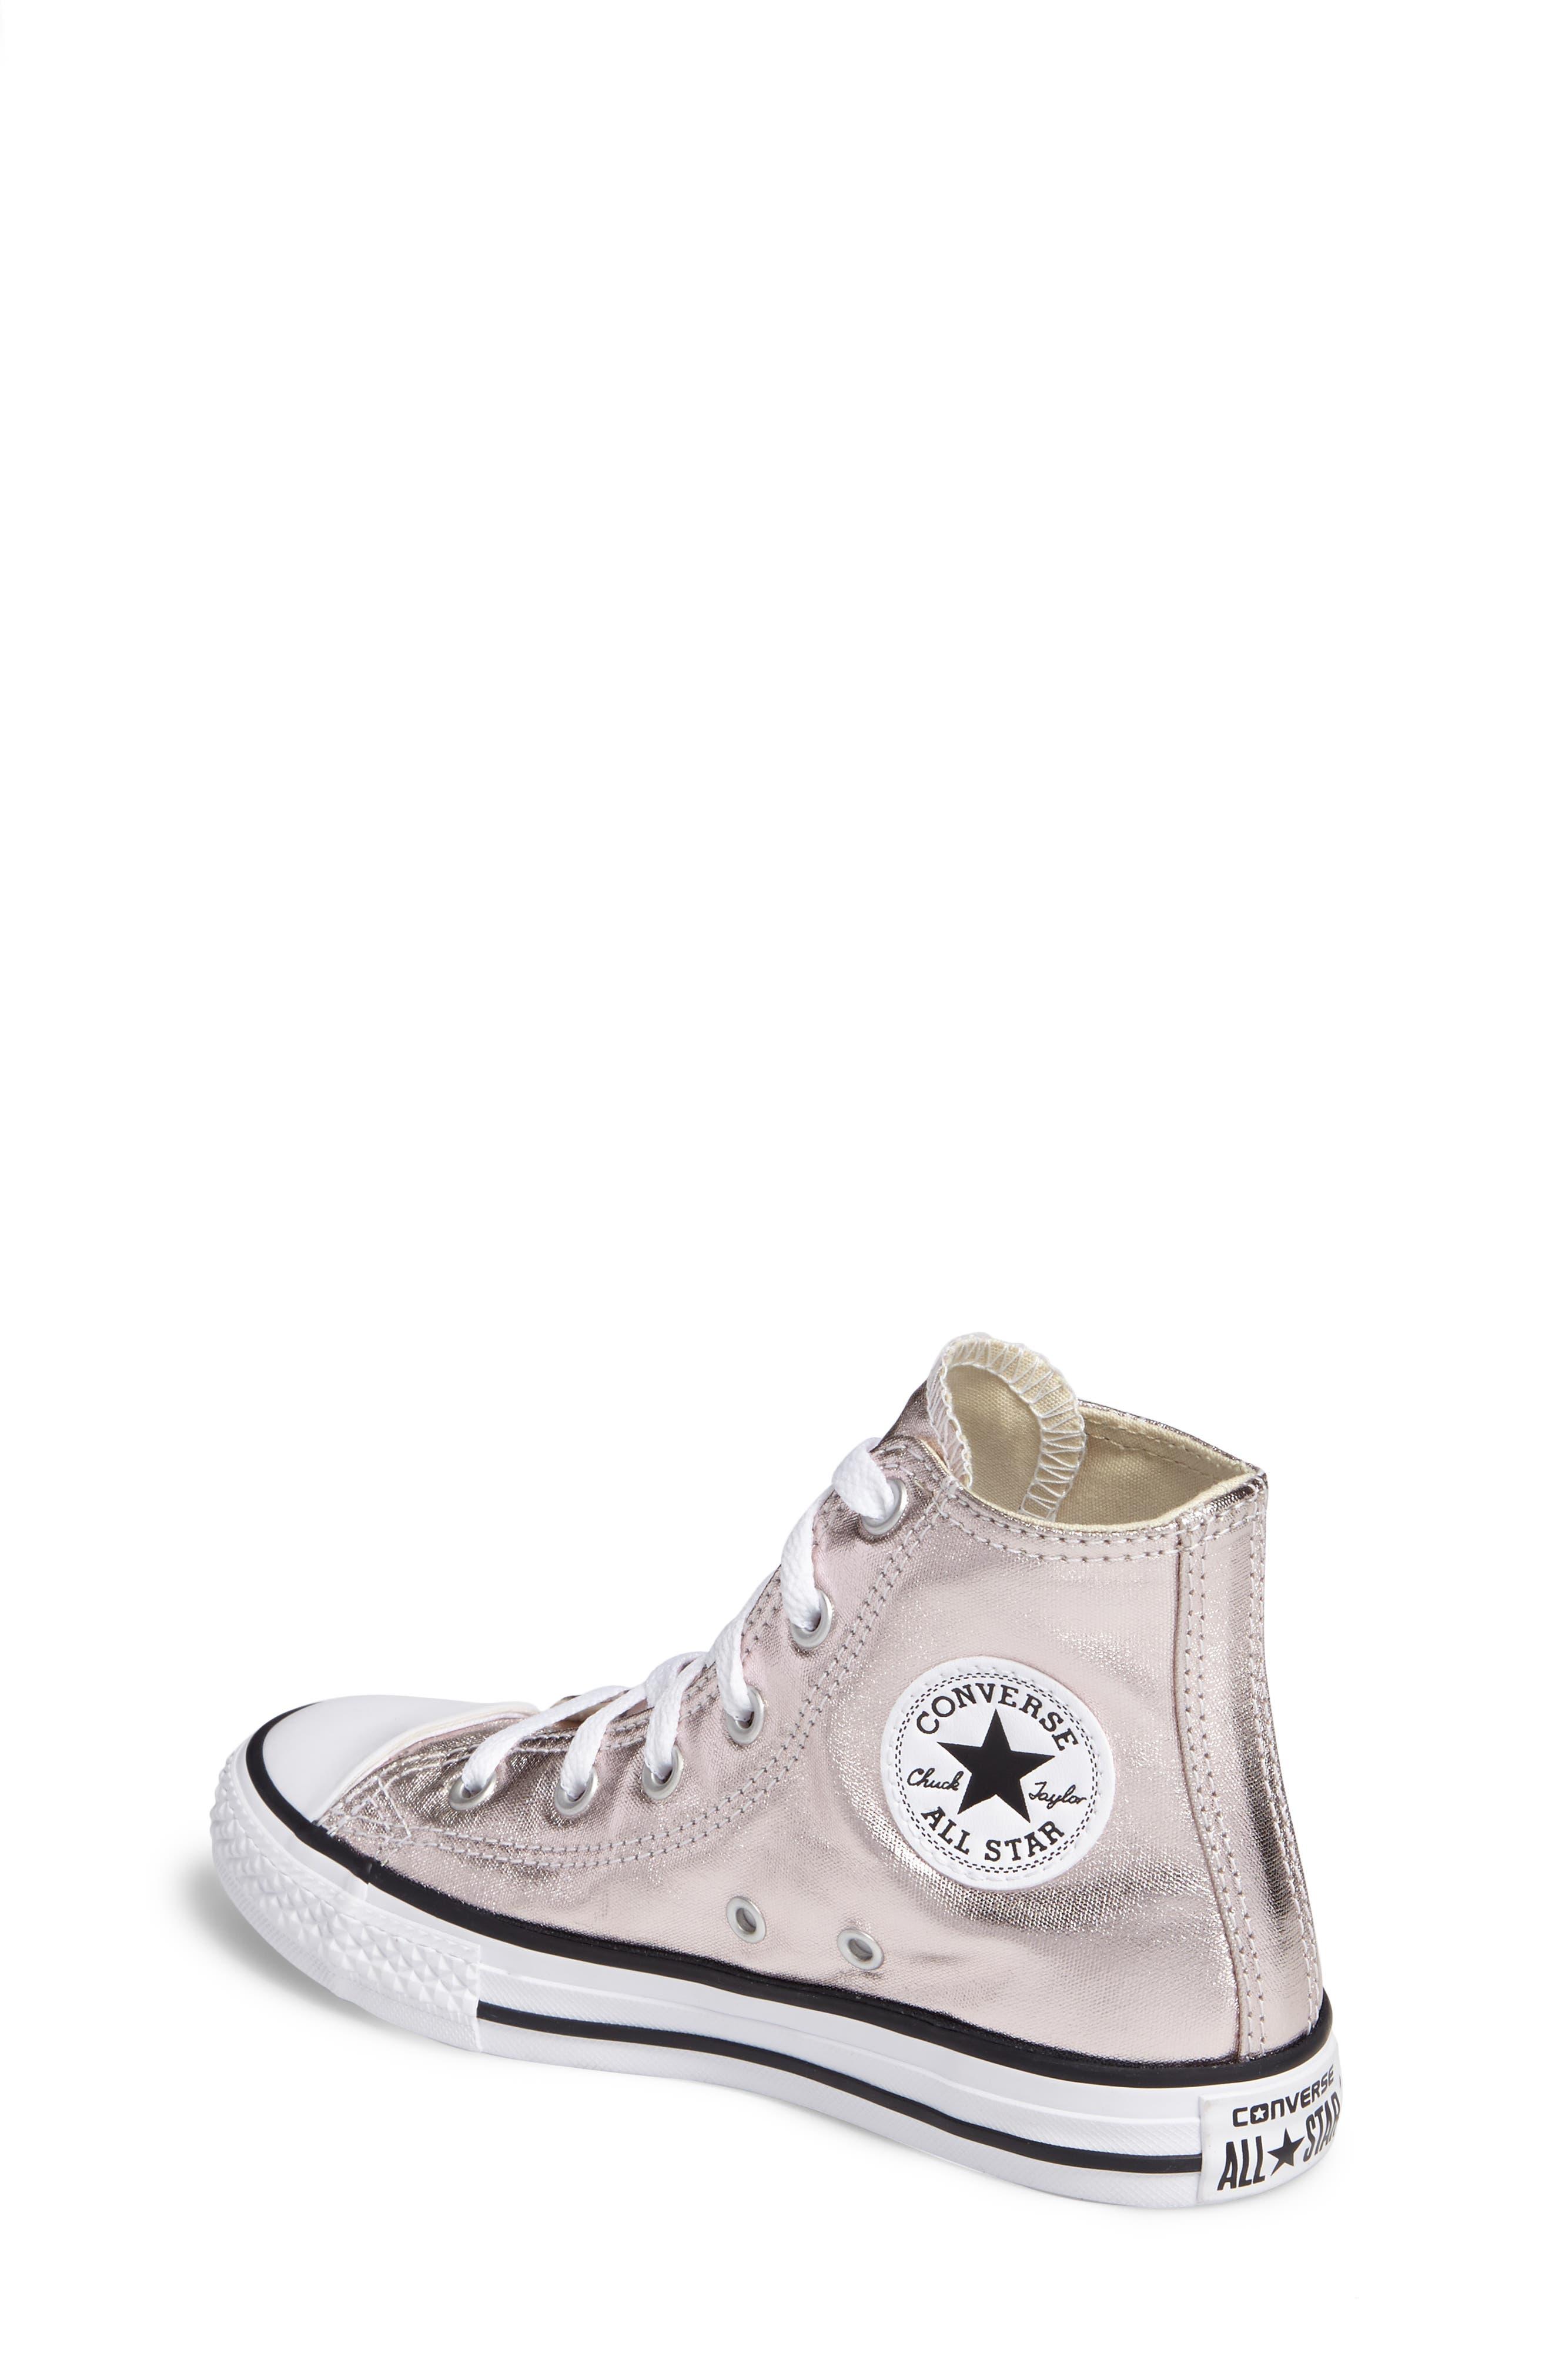 Alternate Image 2  - Converse Chuck Taylor® All Star® Seasonal Metallic High Top Sneaker (Toddler & Little Kid)